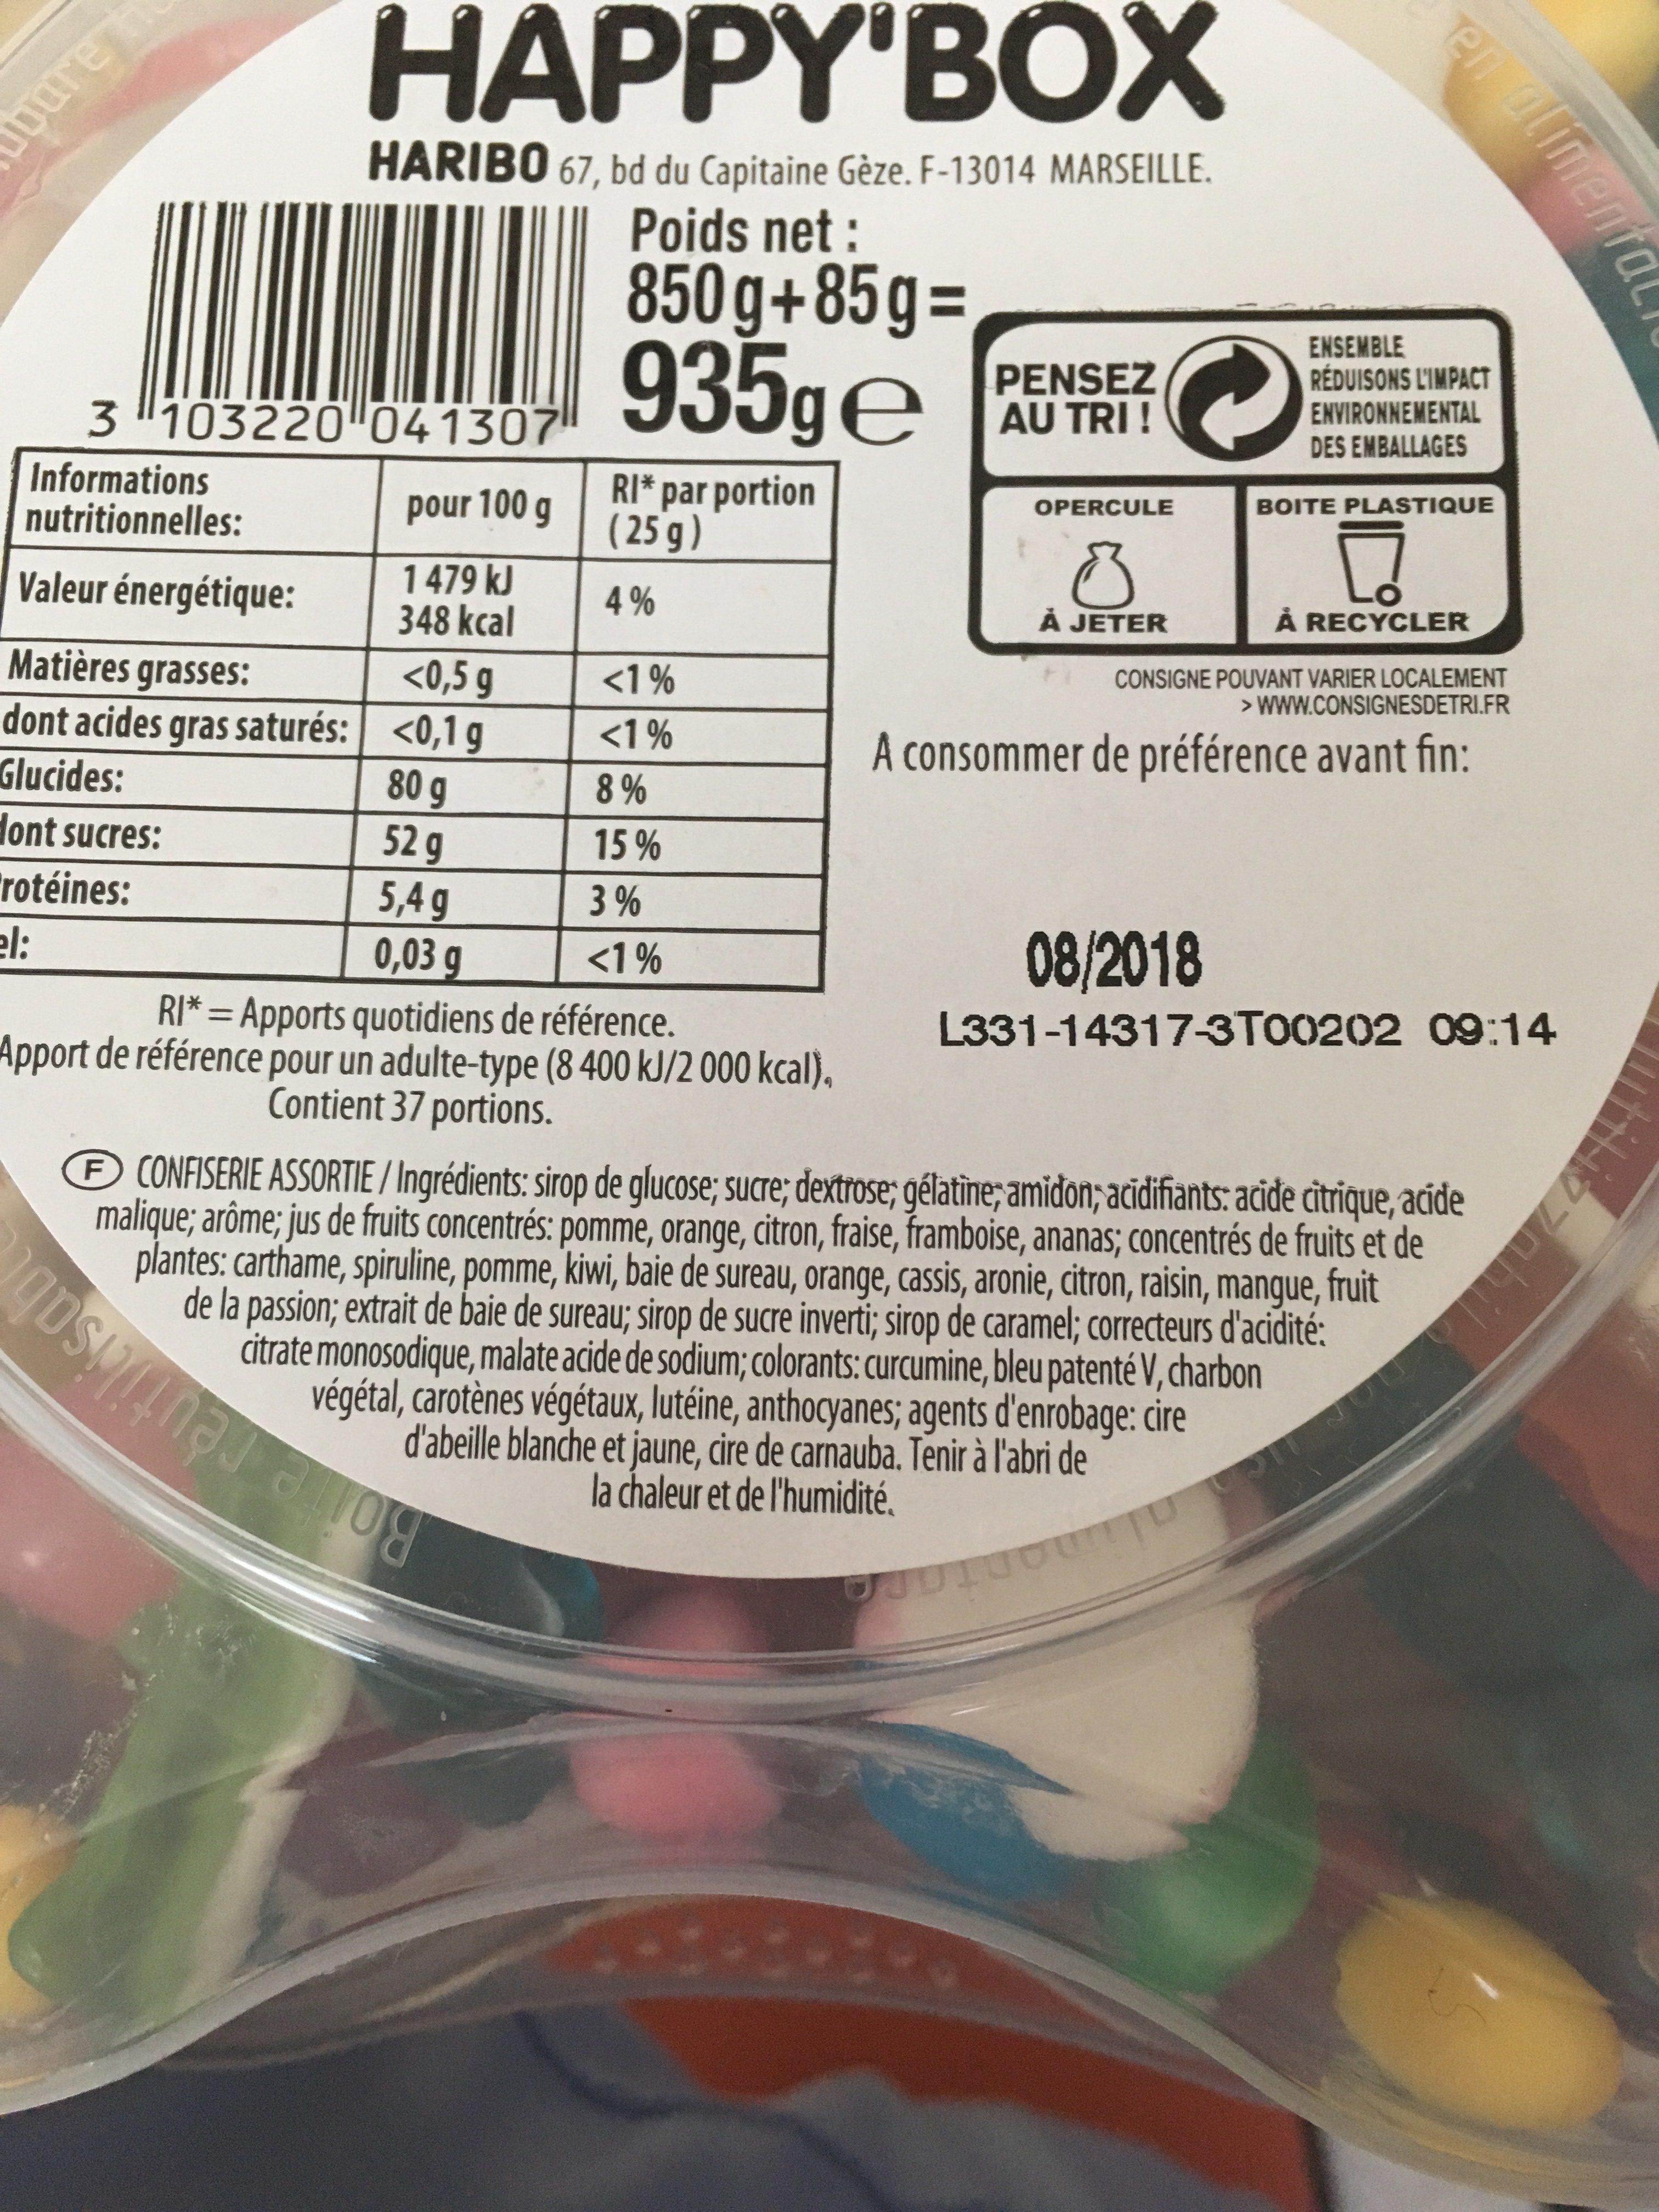 Bonbons Happy' box 850 g - Ingrédients - fr